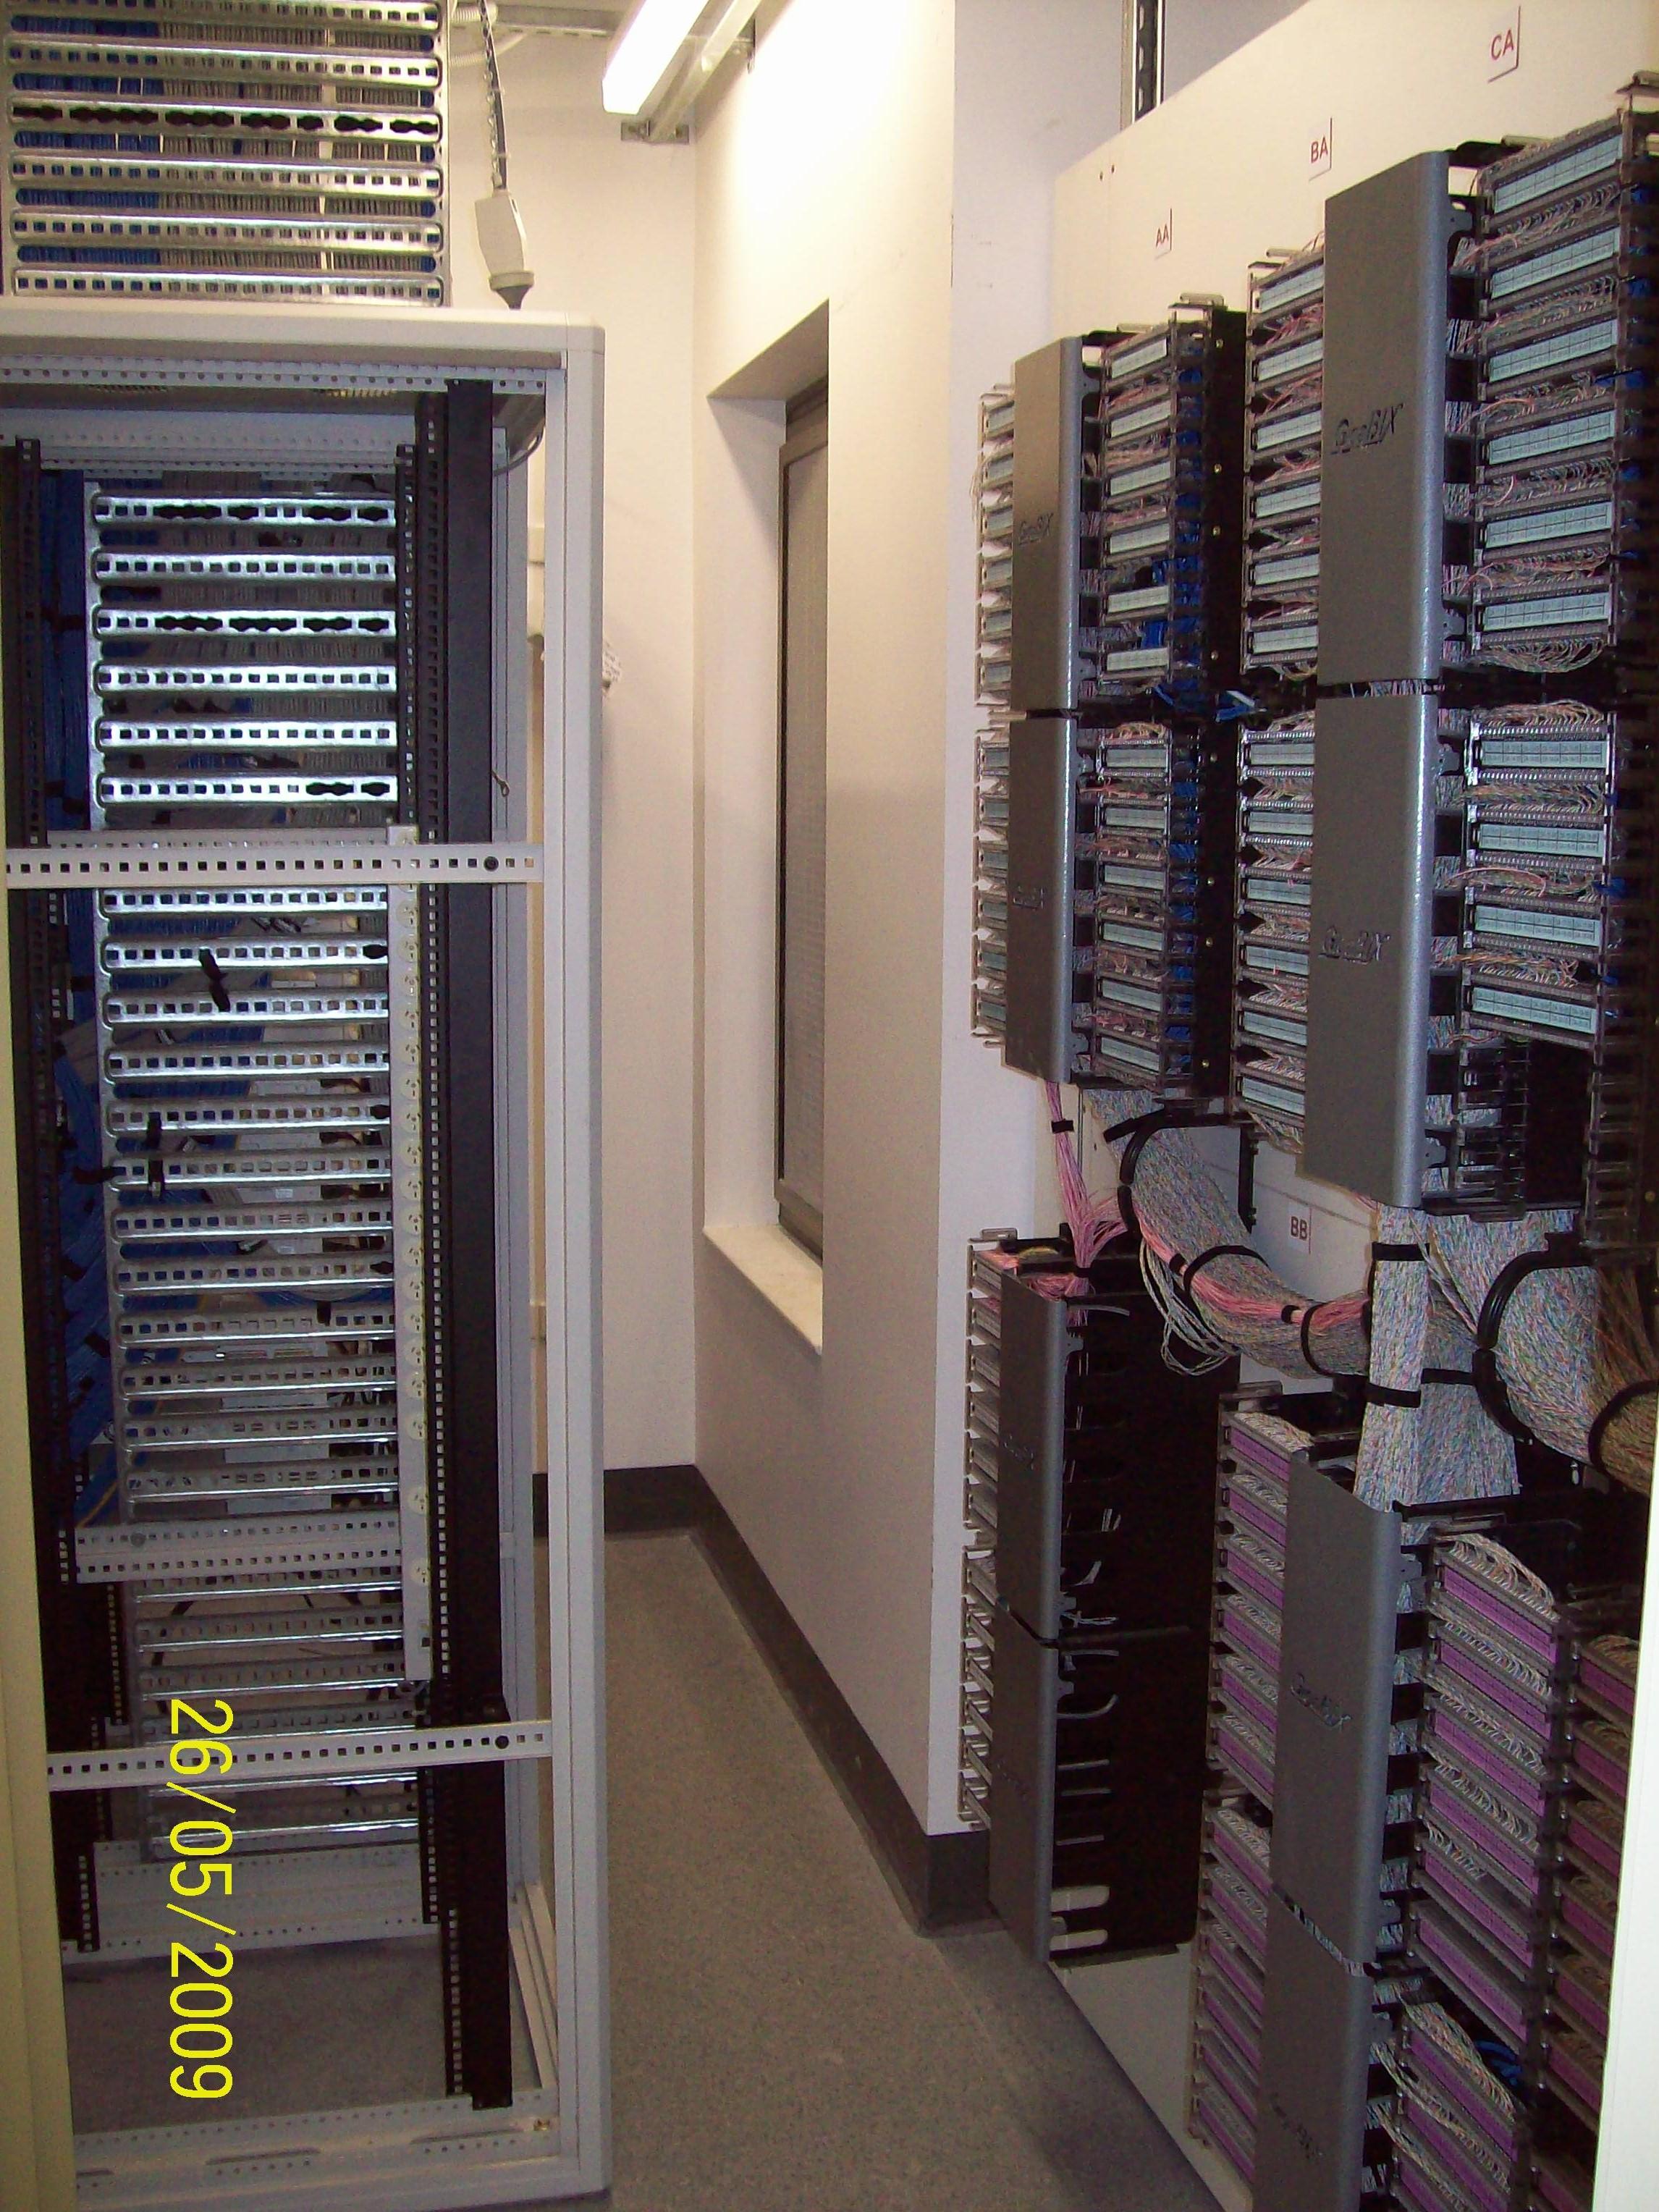 PCH L2 Comms Room.JPG